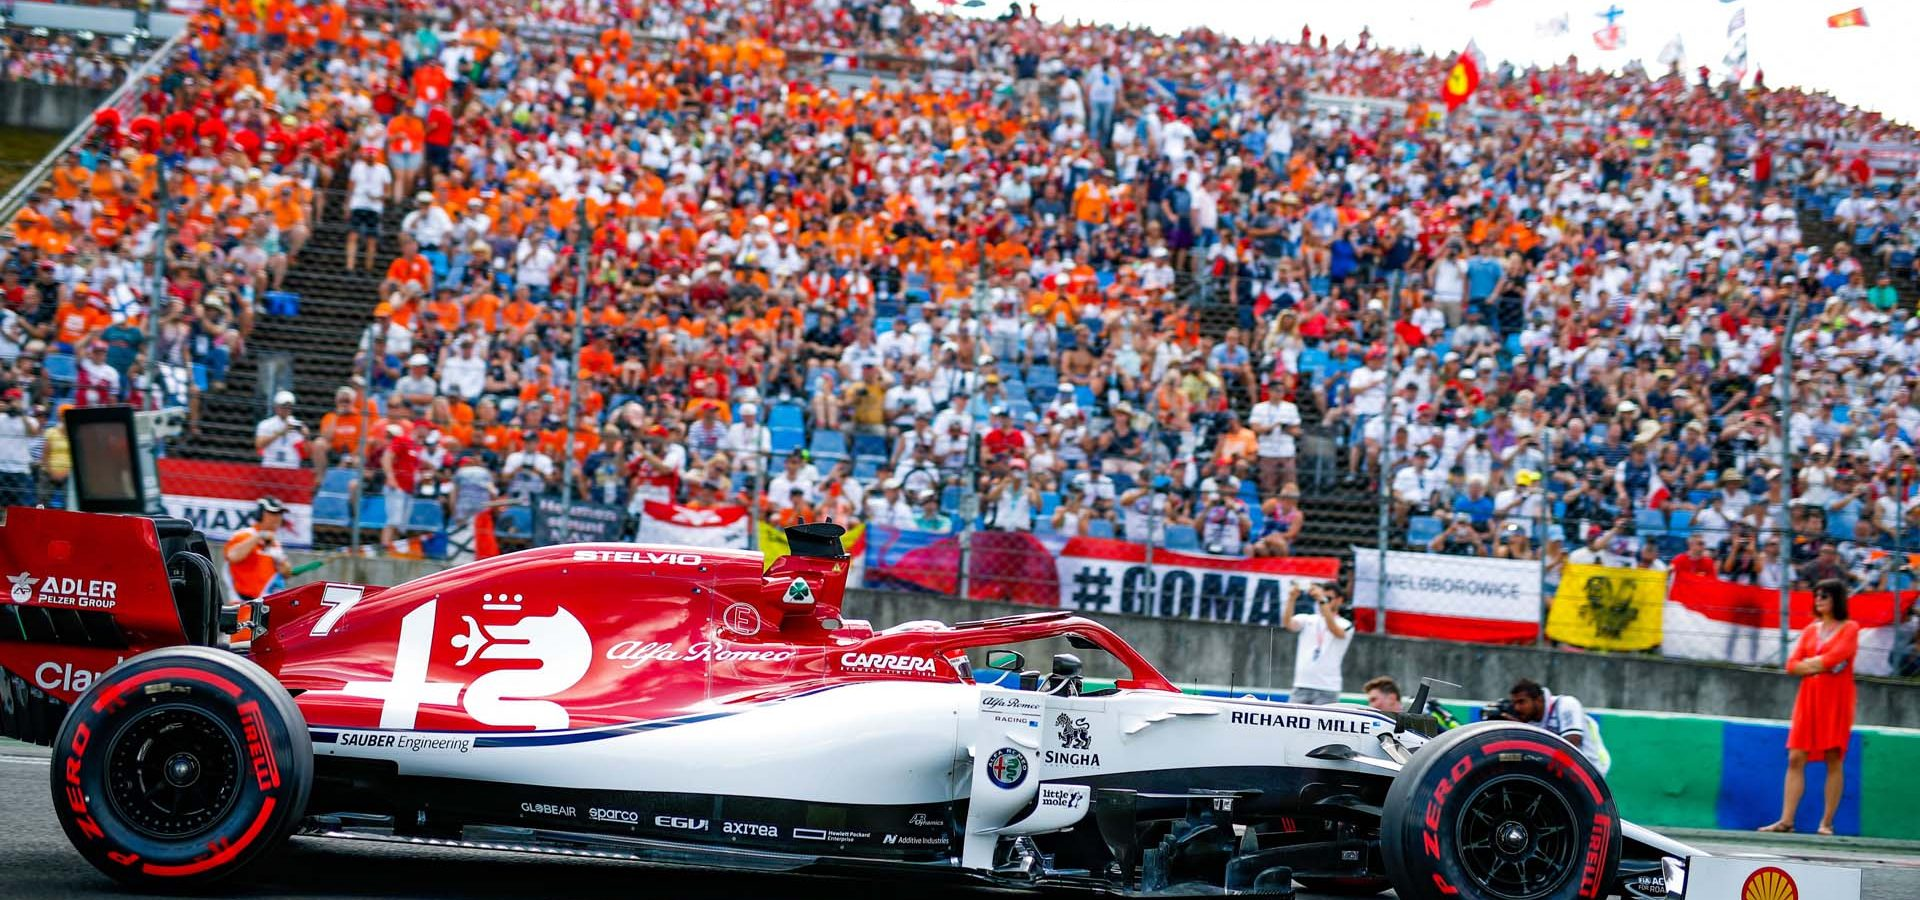 07 RAIKKONEN Kimi (fin), Alfa Romeo Racing C38, action during the 2019 Formula One World Championship, Grand Prix of Hungary from august 1 to 4, Hungaroring, Budapest - Photo Florent Gooden / DPPI